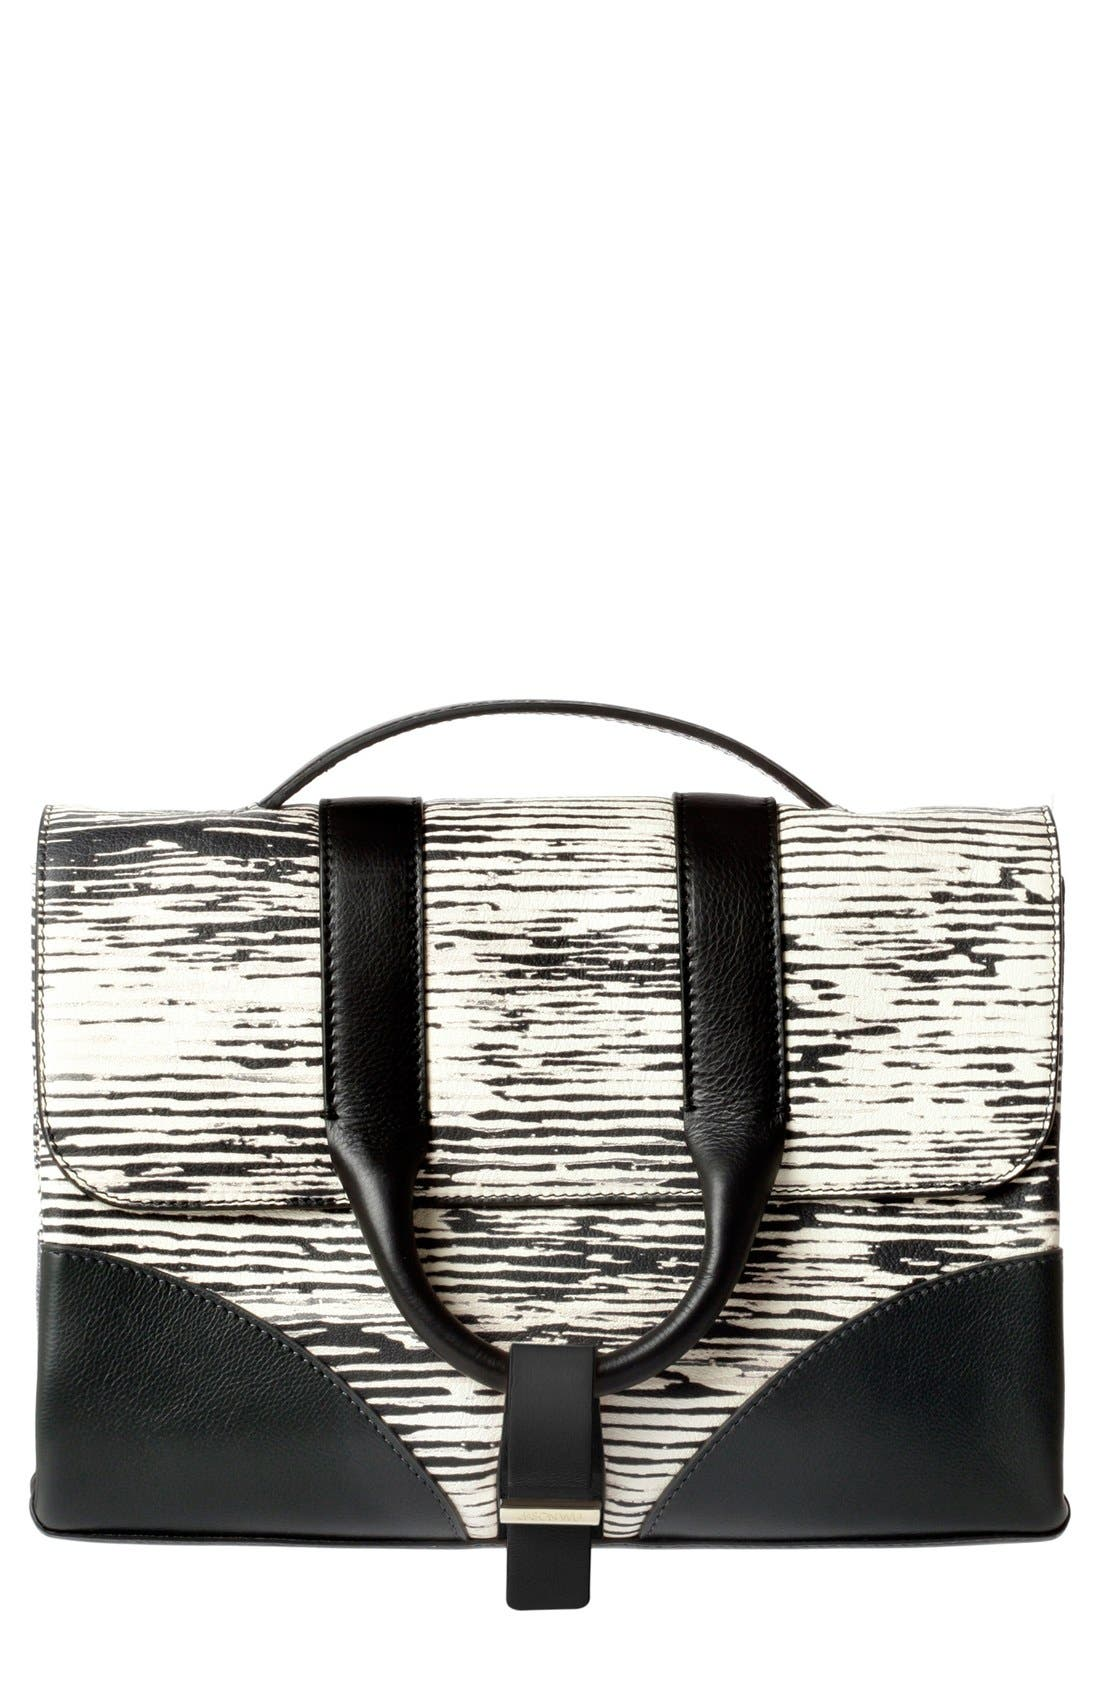 Alternate Image 1 Selected - Jason Wu 'Hanne' Printed Calfskin Leather Messenger Bag